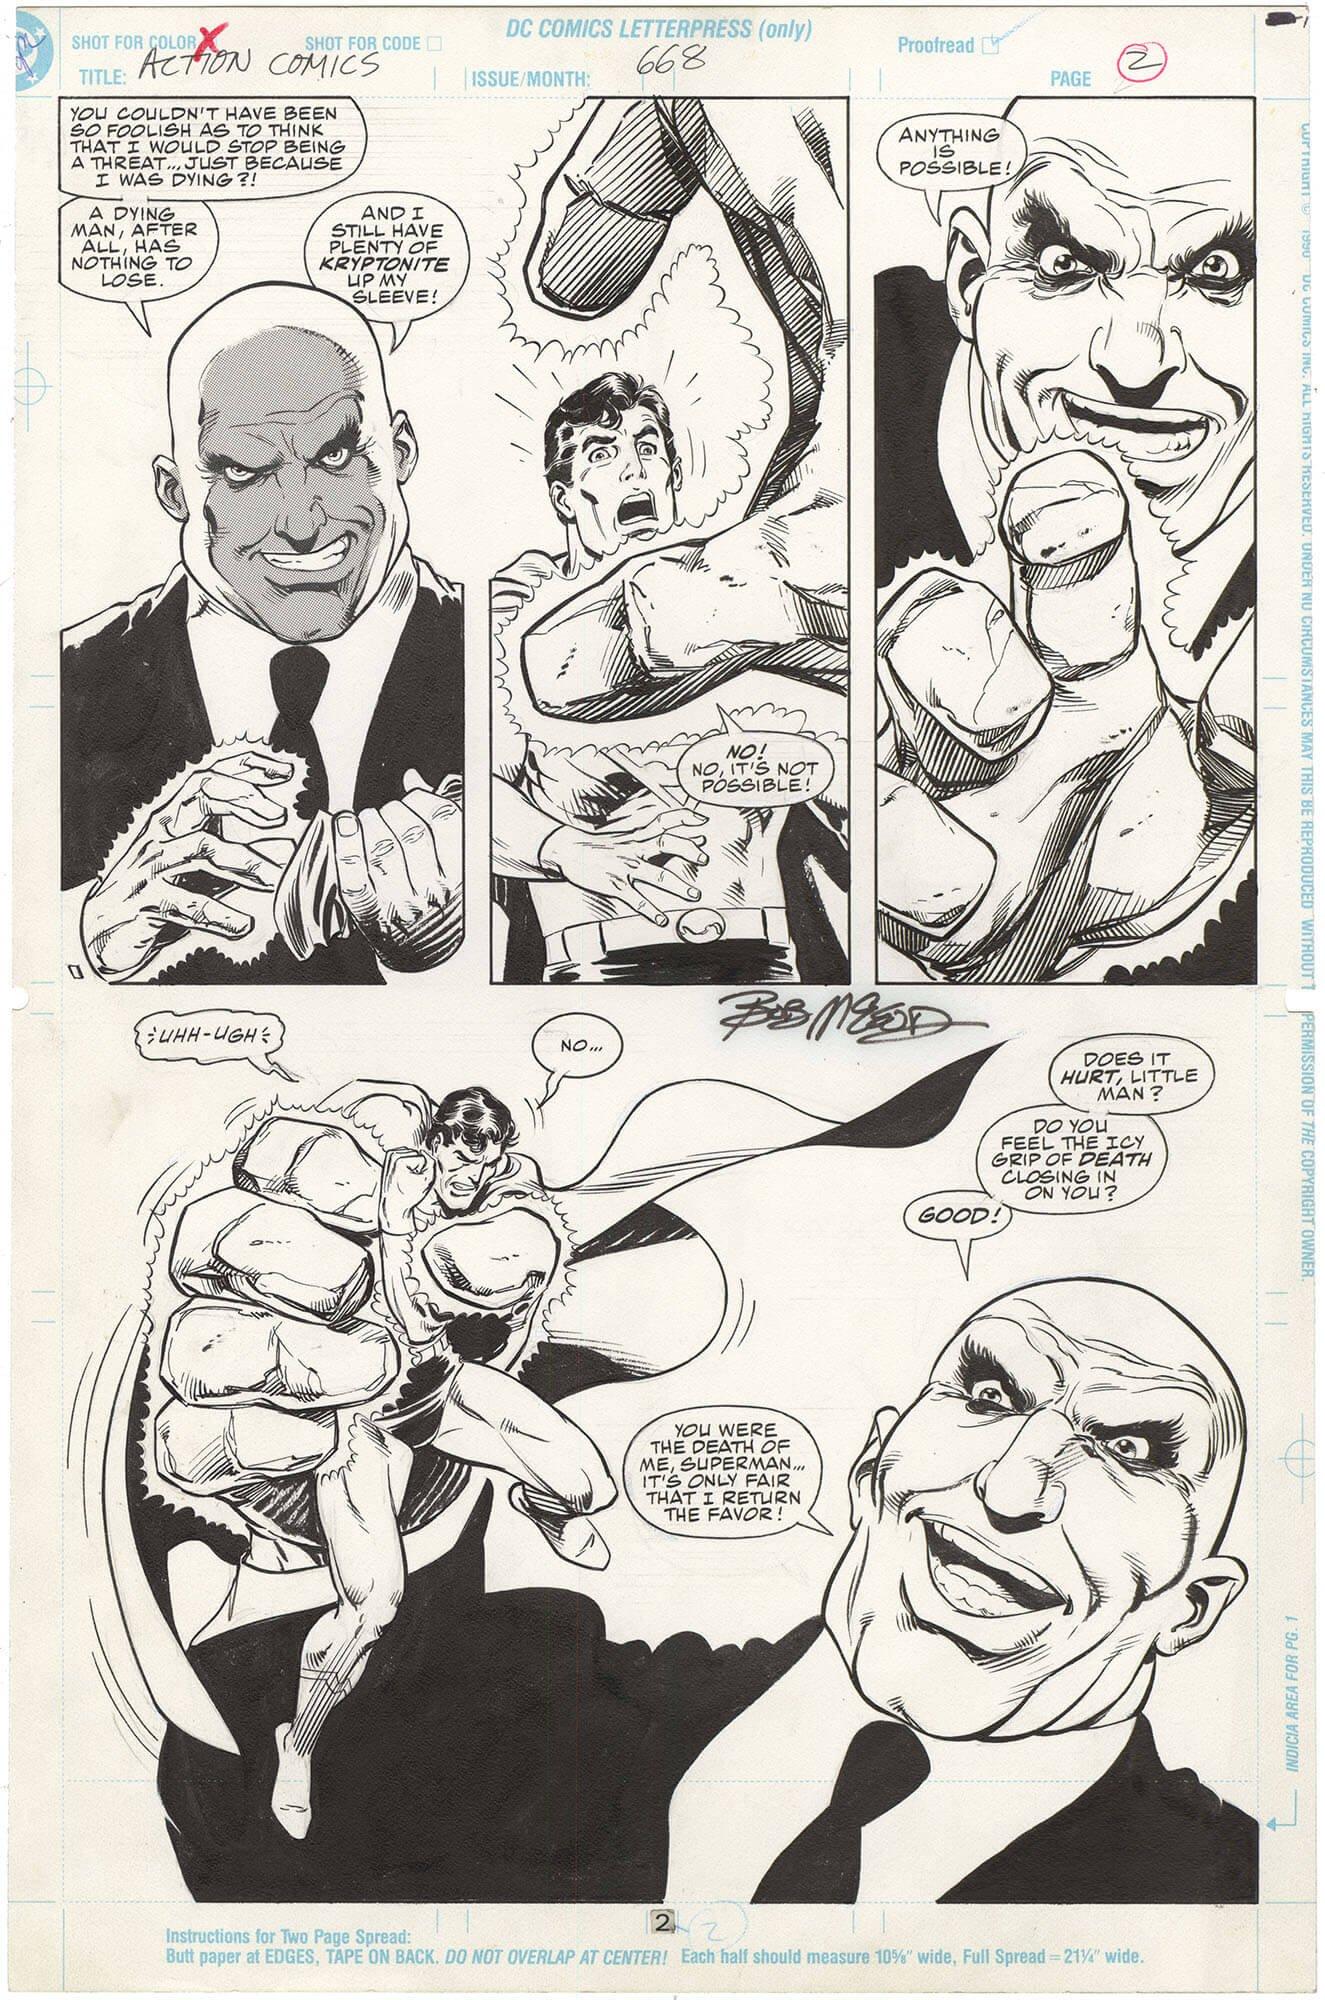 Action Comics #668 p2 (Half Splash-Signed)